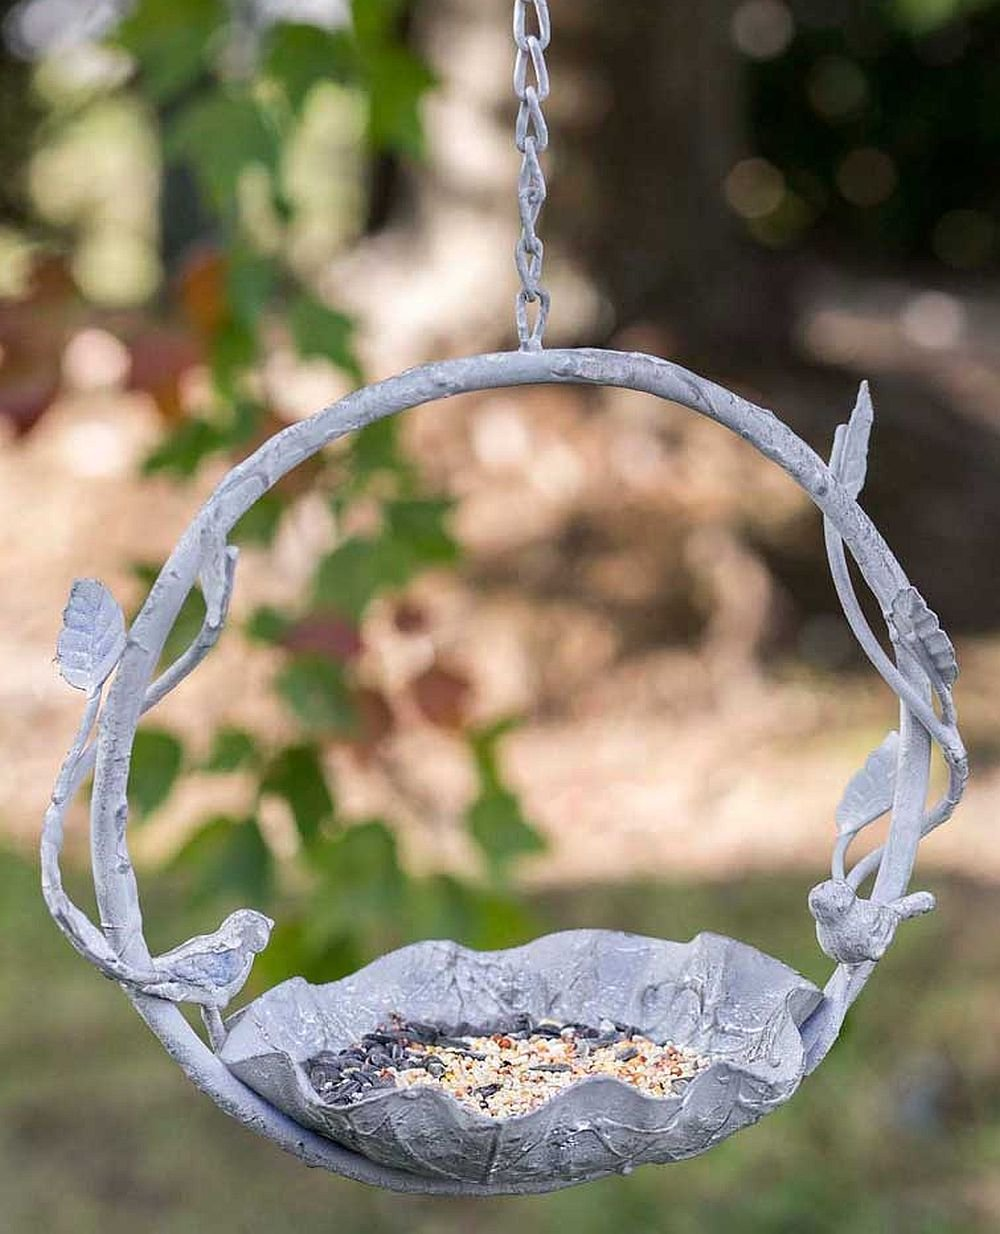 CTW 450047 Small Decorative Hanging Finchwood Rustic Bird Feeder for Outdoor Garden Yard Decor Cast Iron Metal Farmhouse Style Home Decor Gray